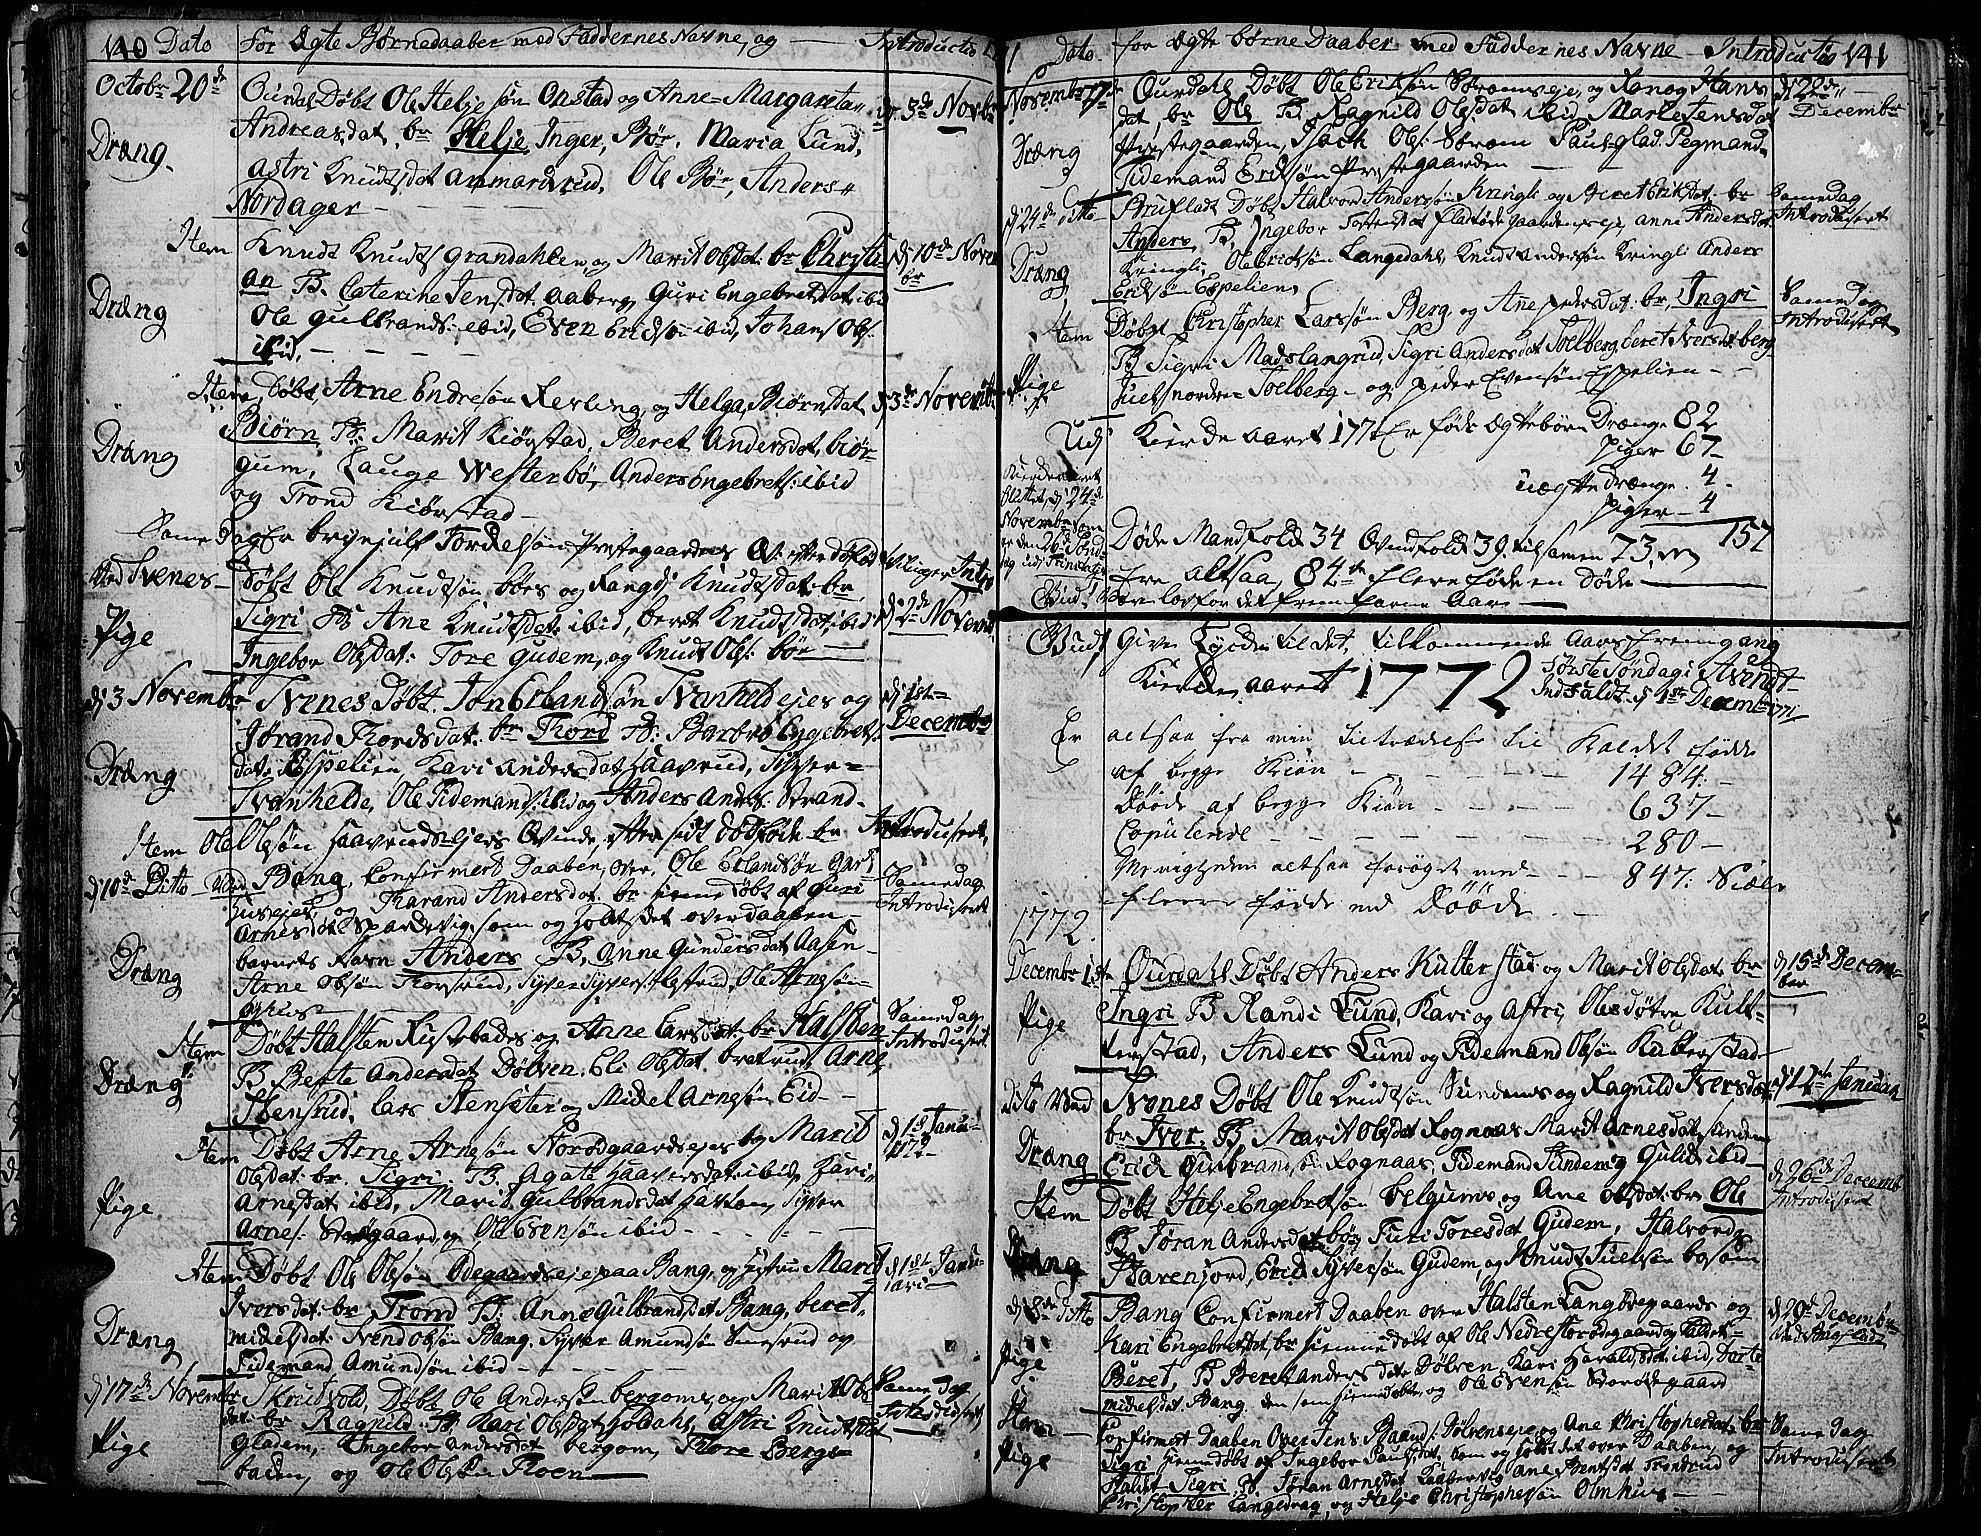 SAH, Aurdal prestekontor, Ministerialbok nr. 5, 1763-1781, s. 140-141